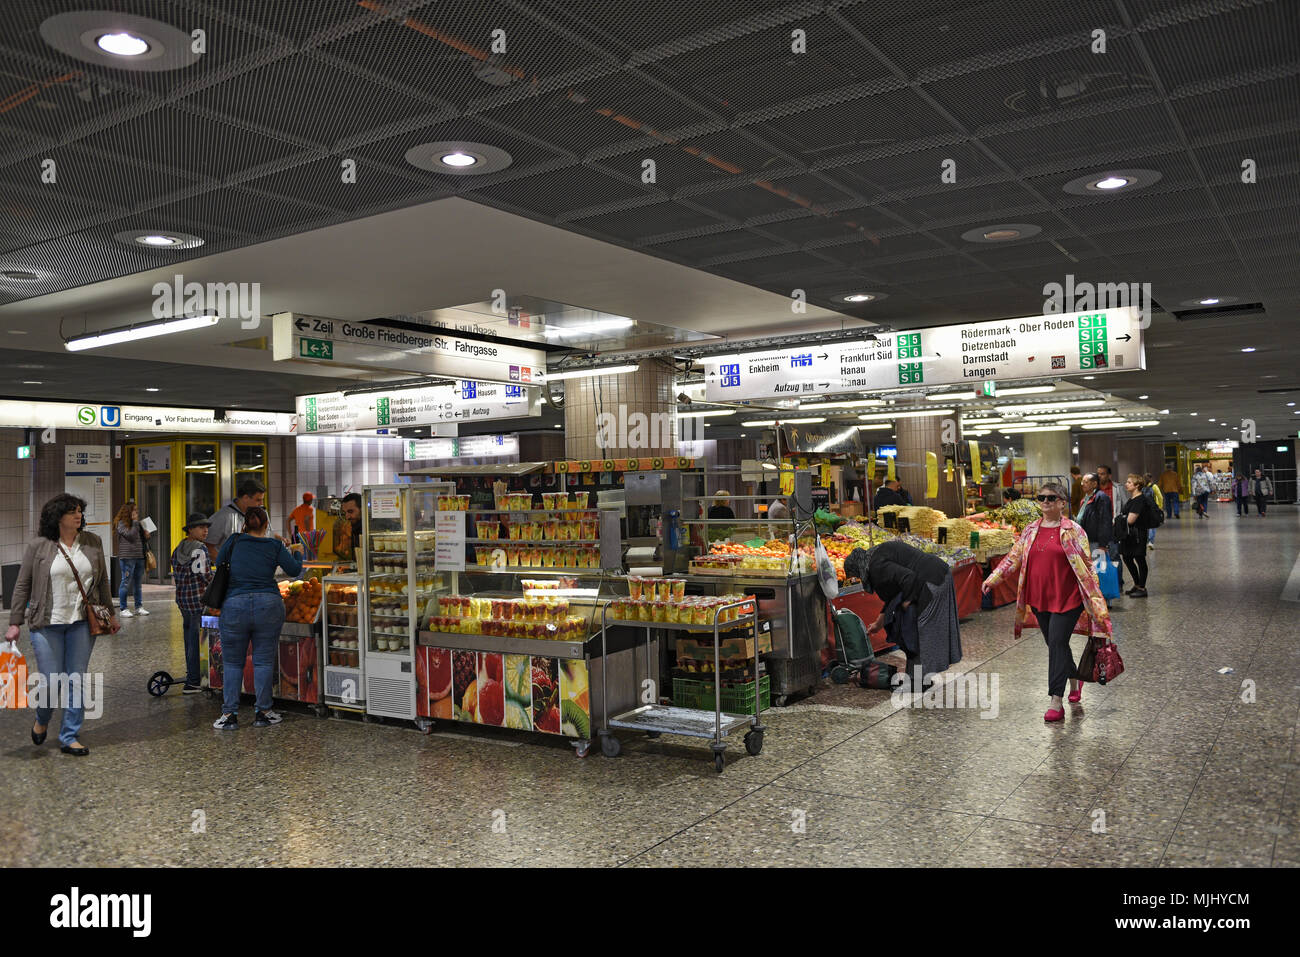 fruit and vegetable stalls in the underground station konstablerwache, frankfurt, germany - Stock Image